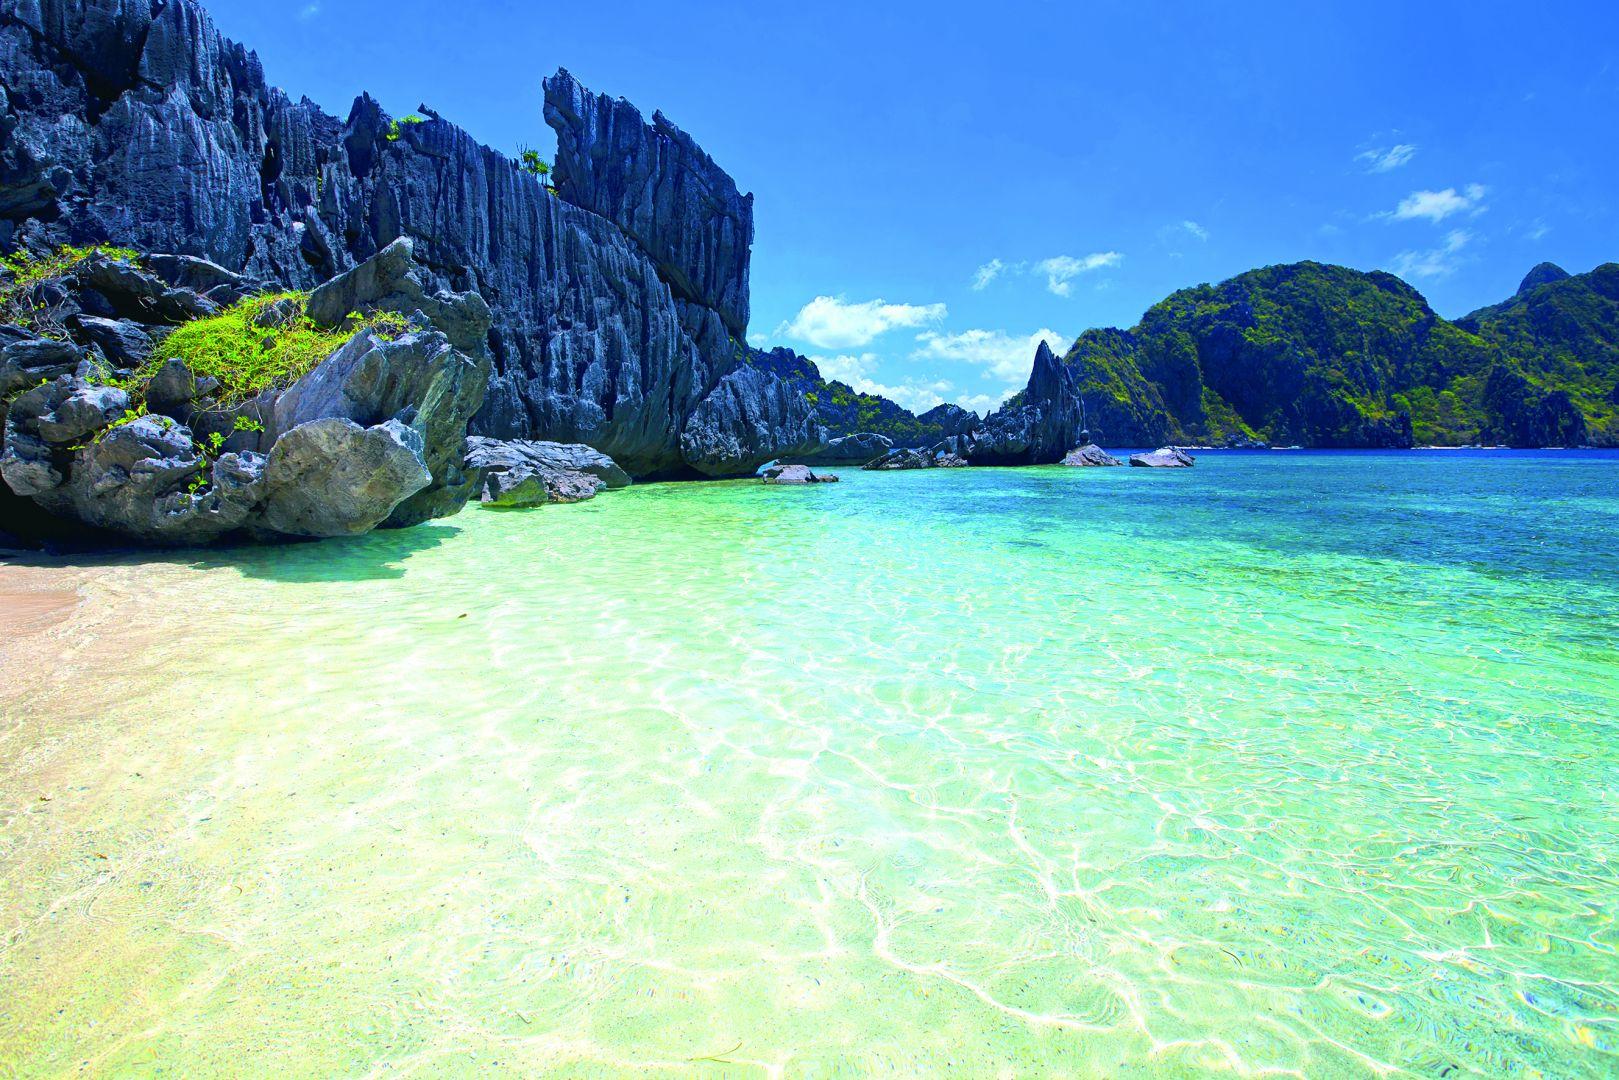 plage-philippines-palawan-el-nido